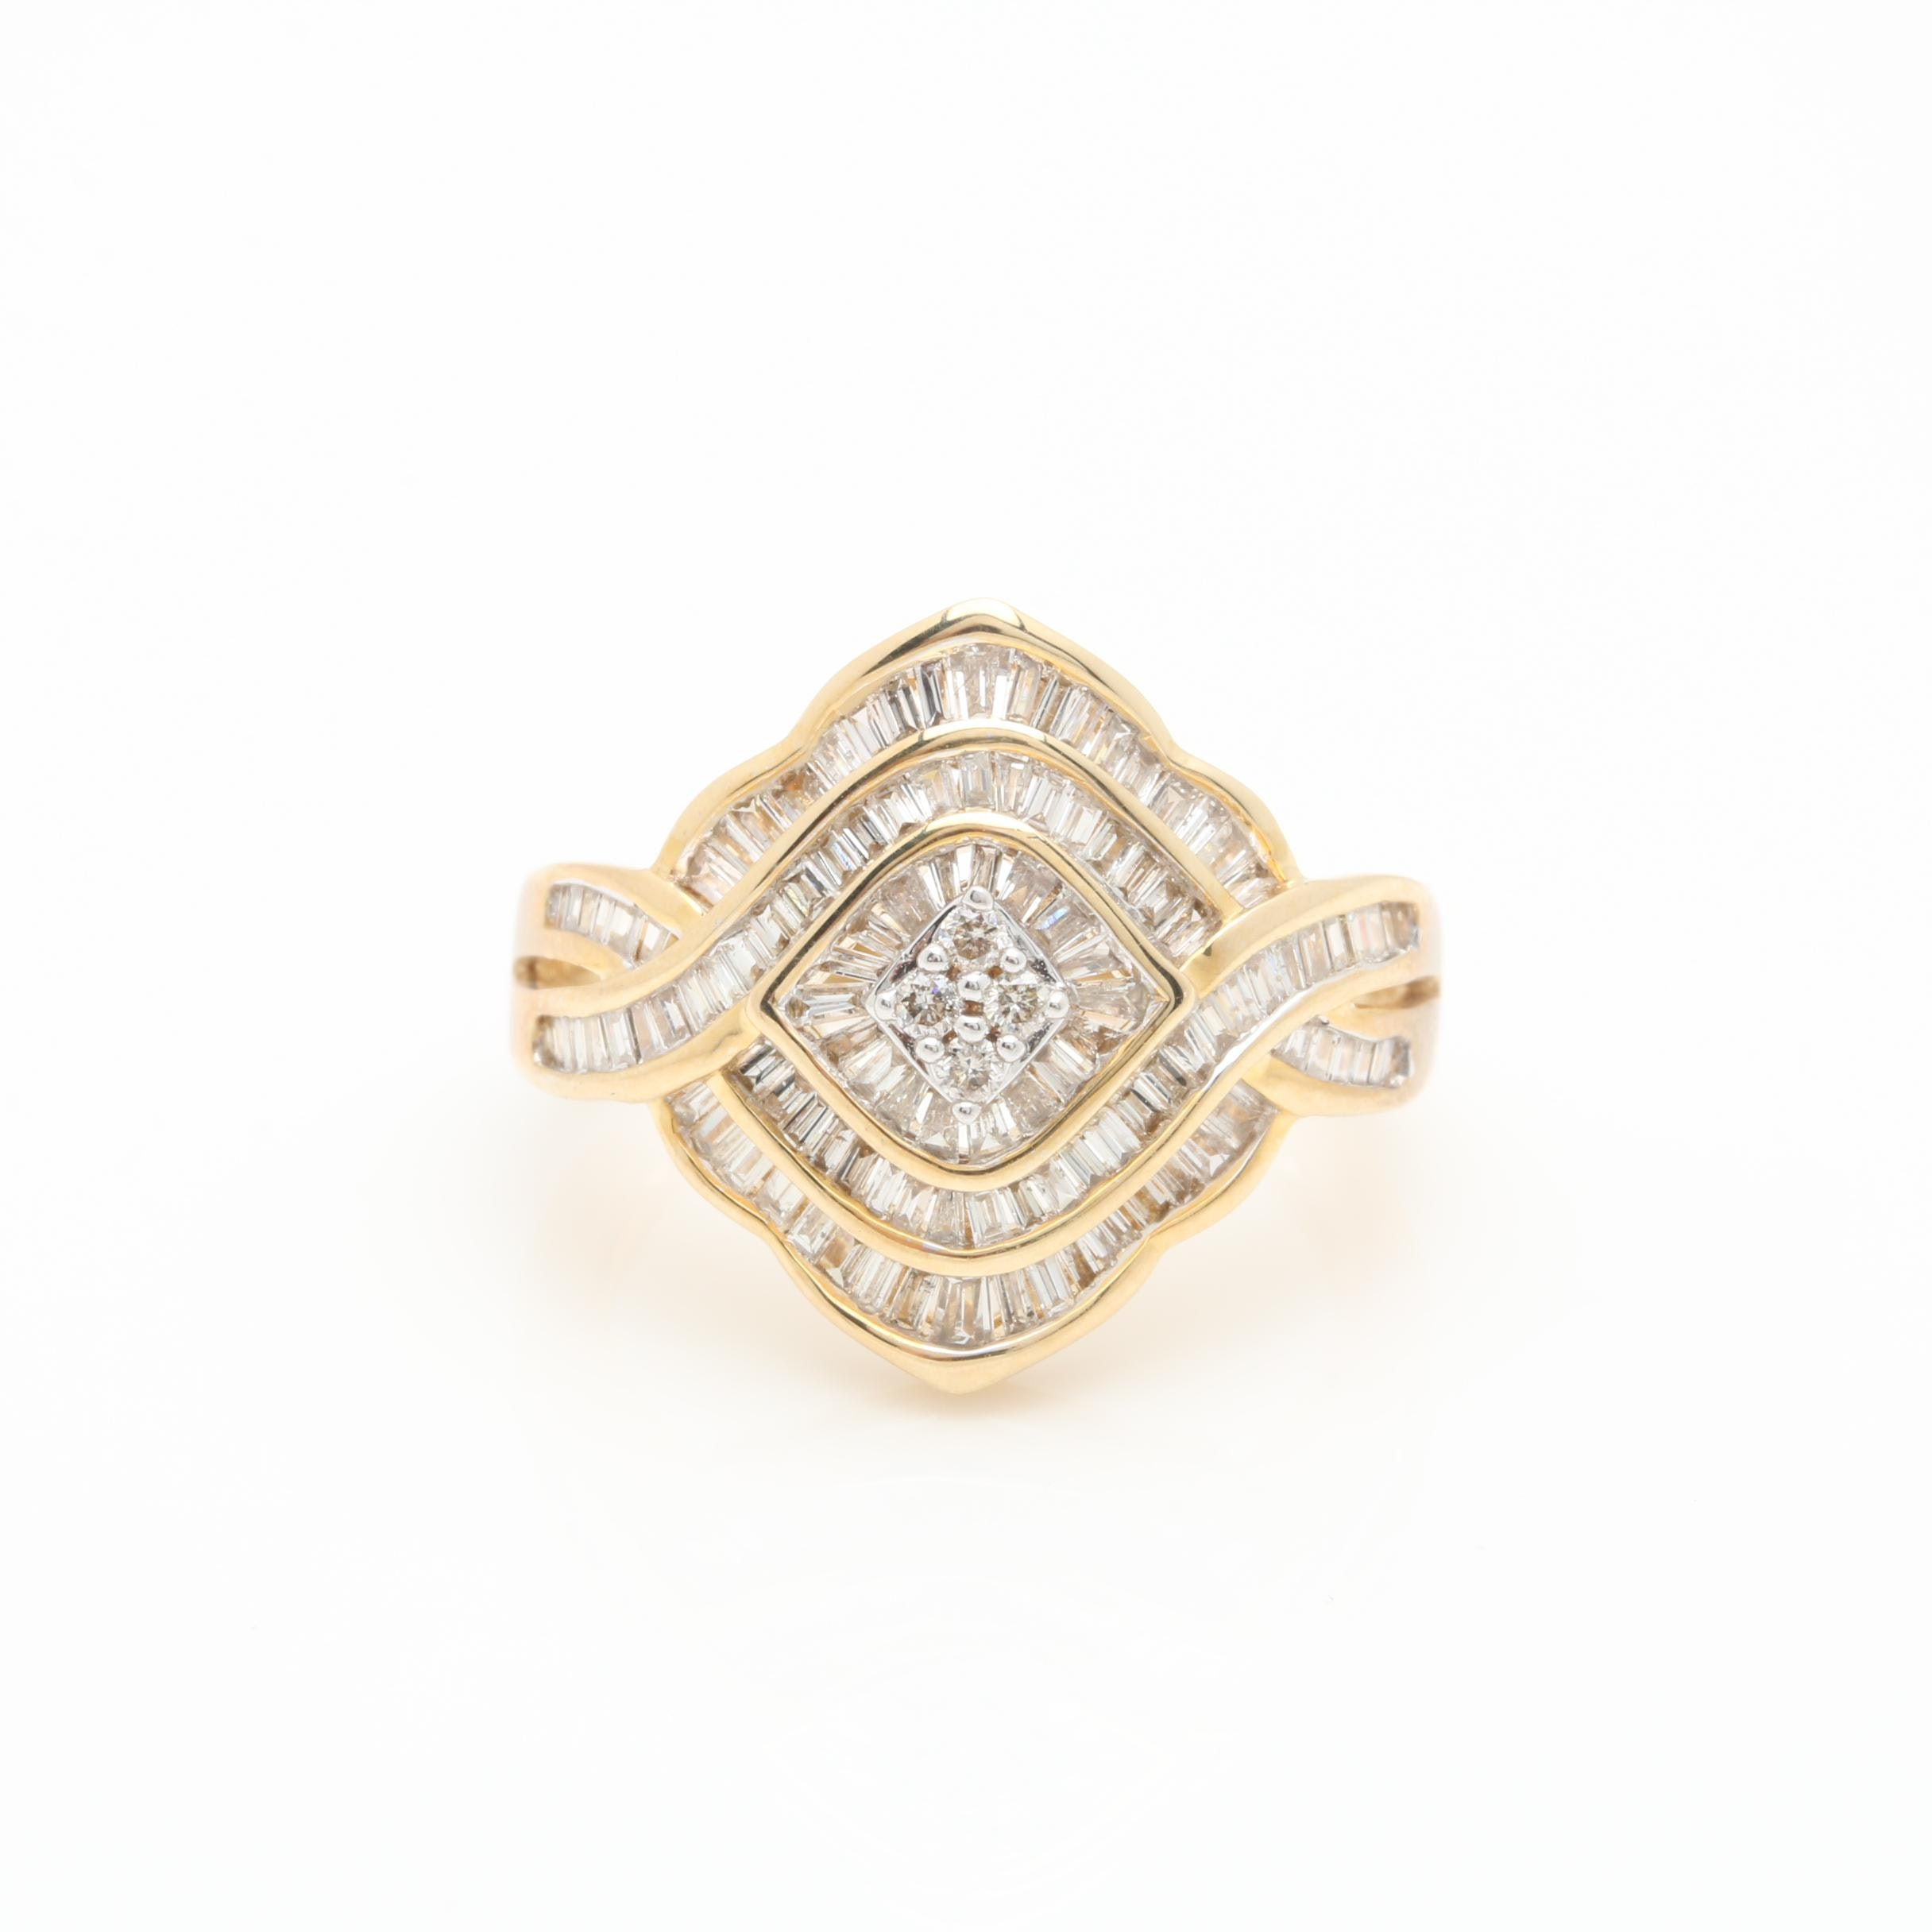 10K Yellow Gold 1.22 CTW Diamond Ring